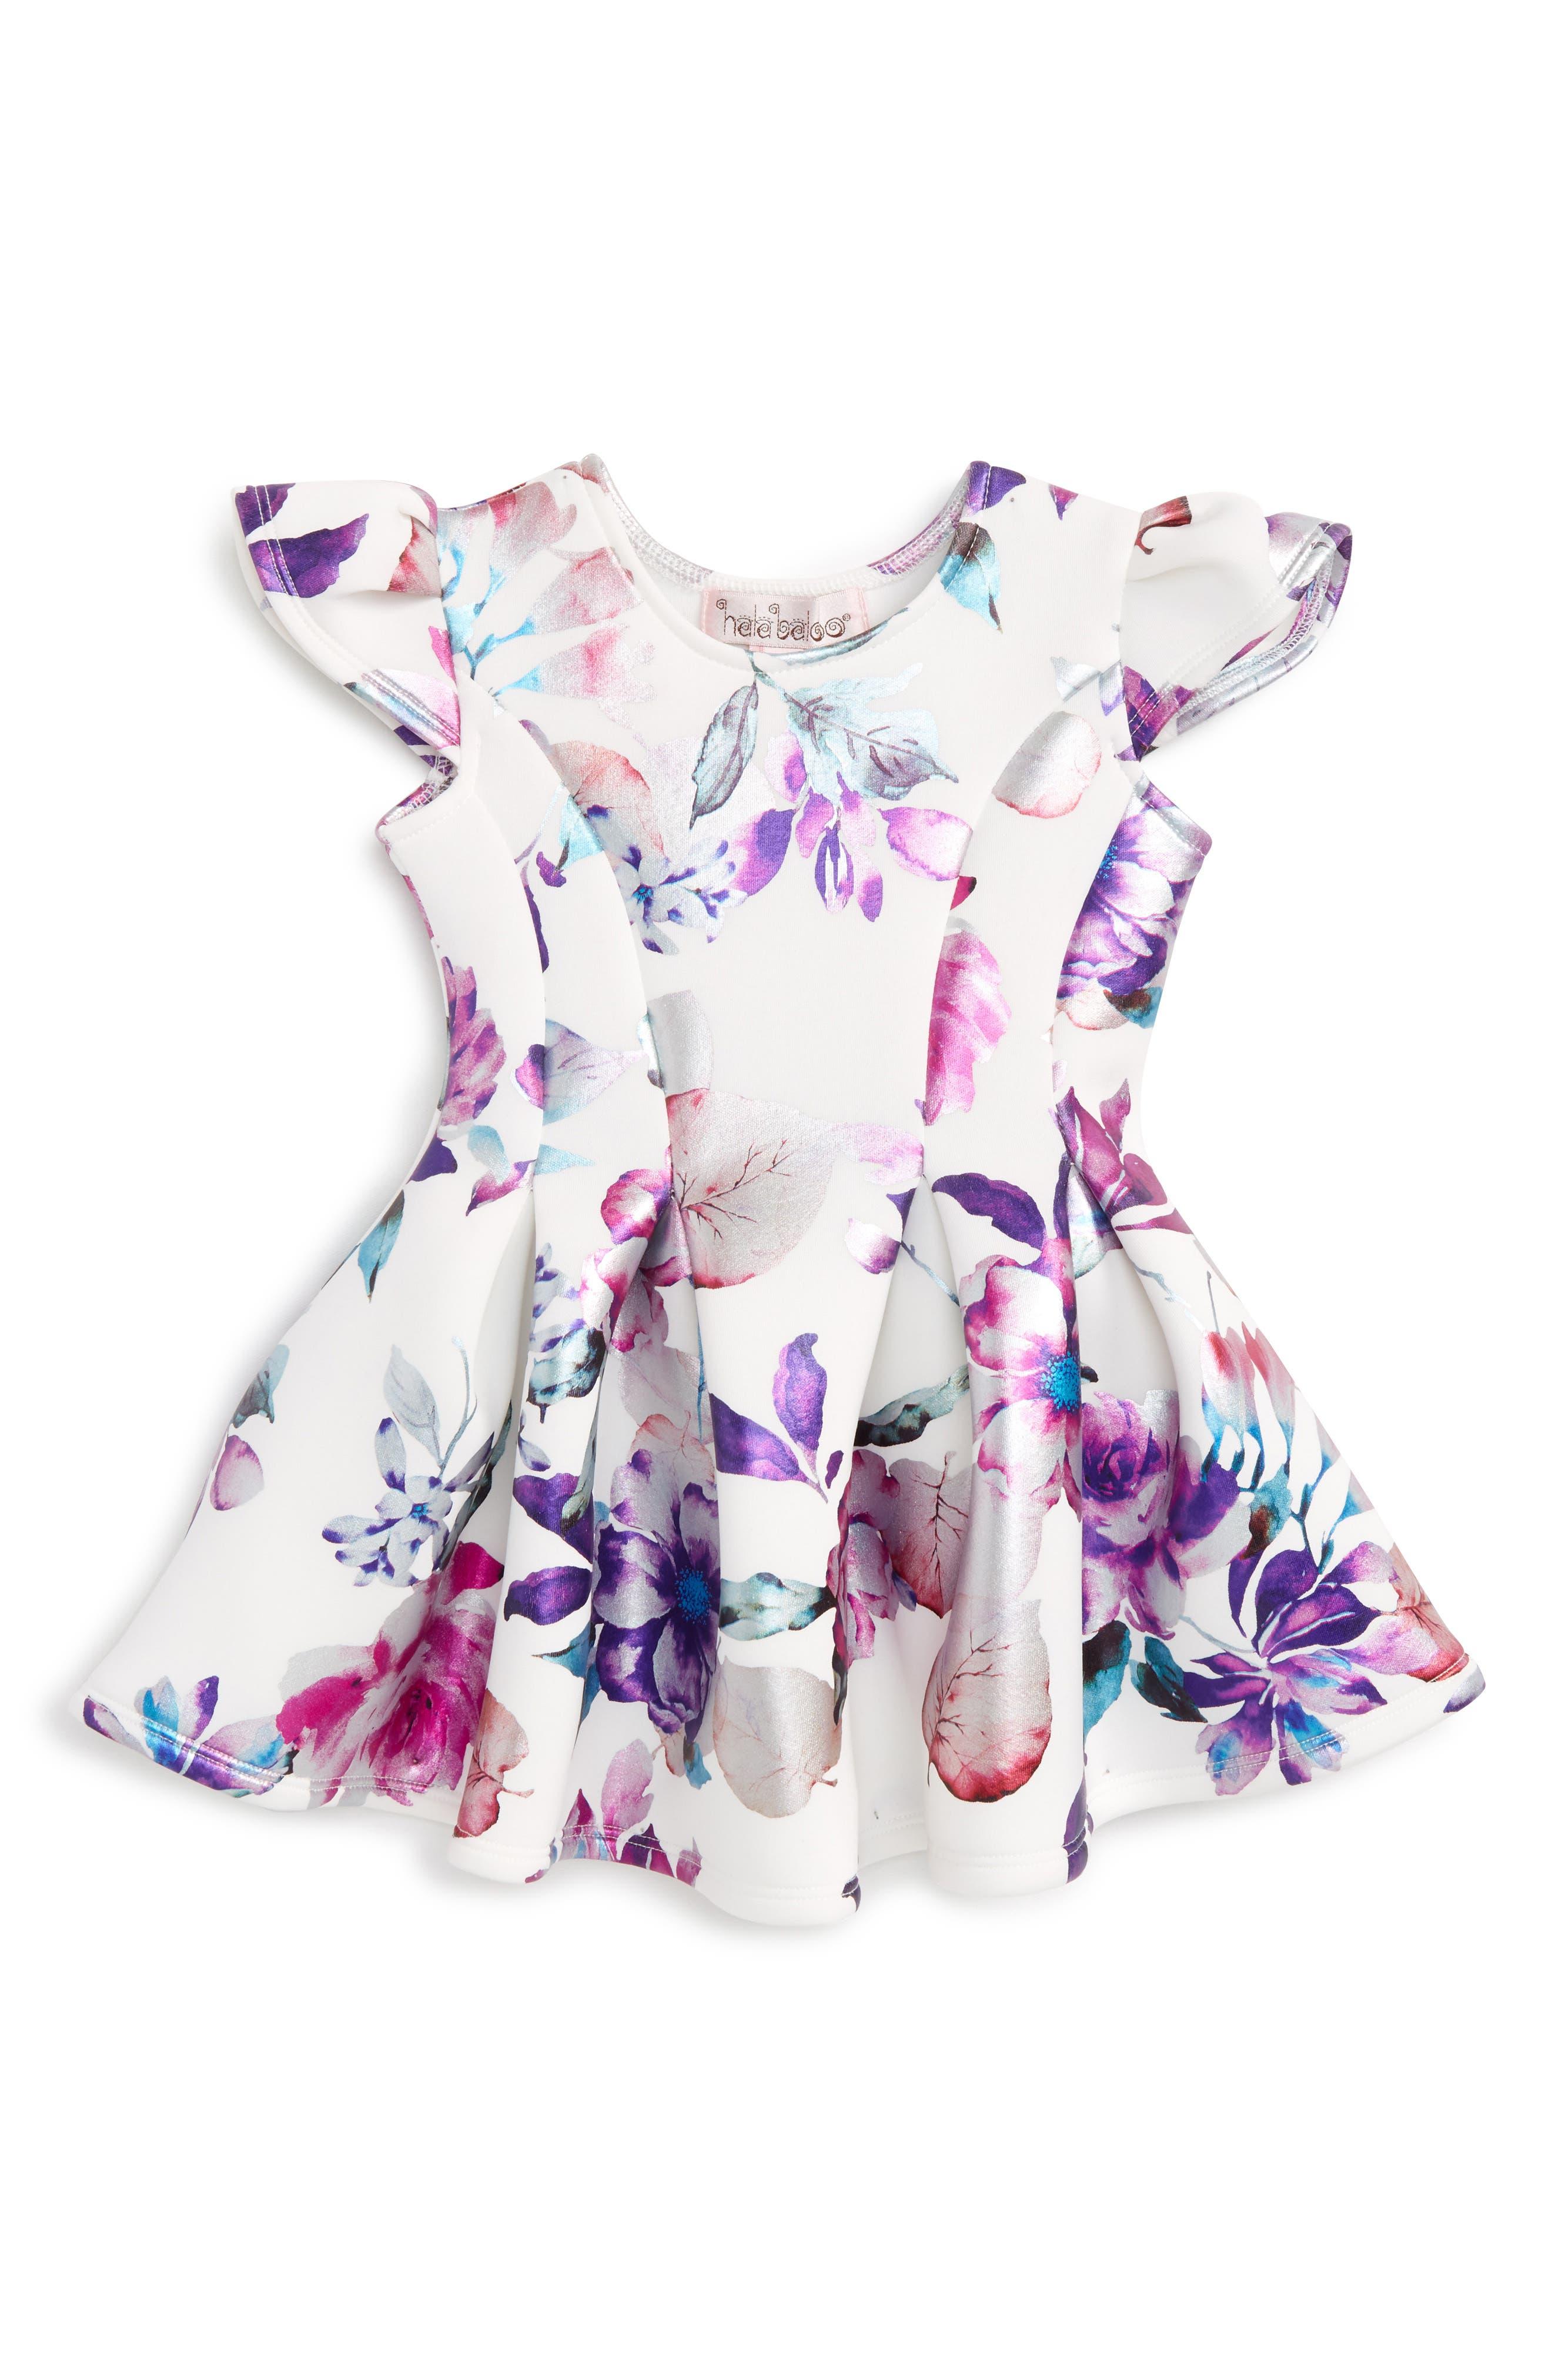 Alternate Image 1 Selected - Halabaloo Floral Print Scuba Dress (Baby Girls)